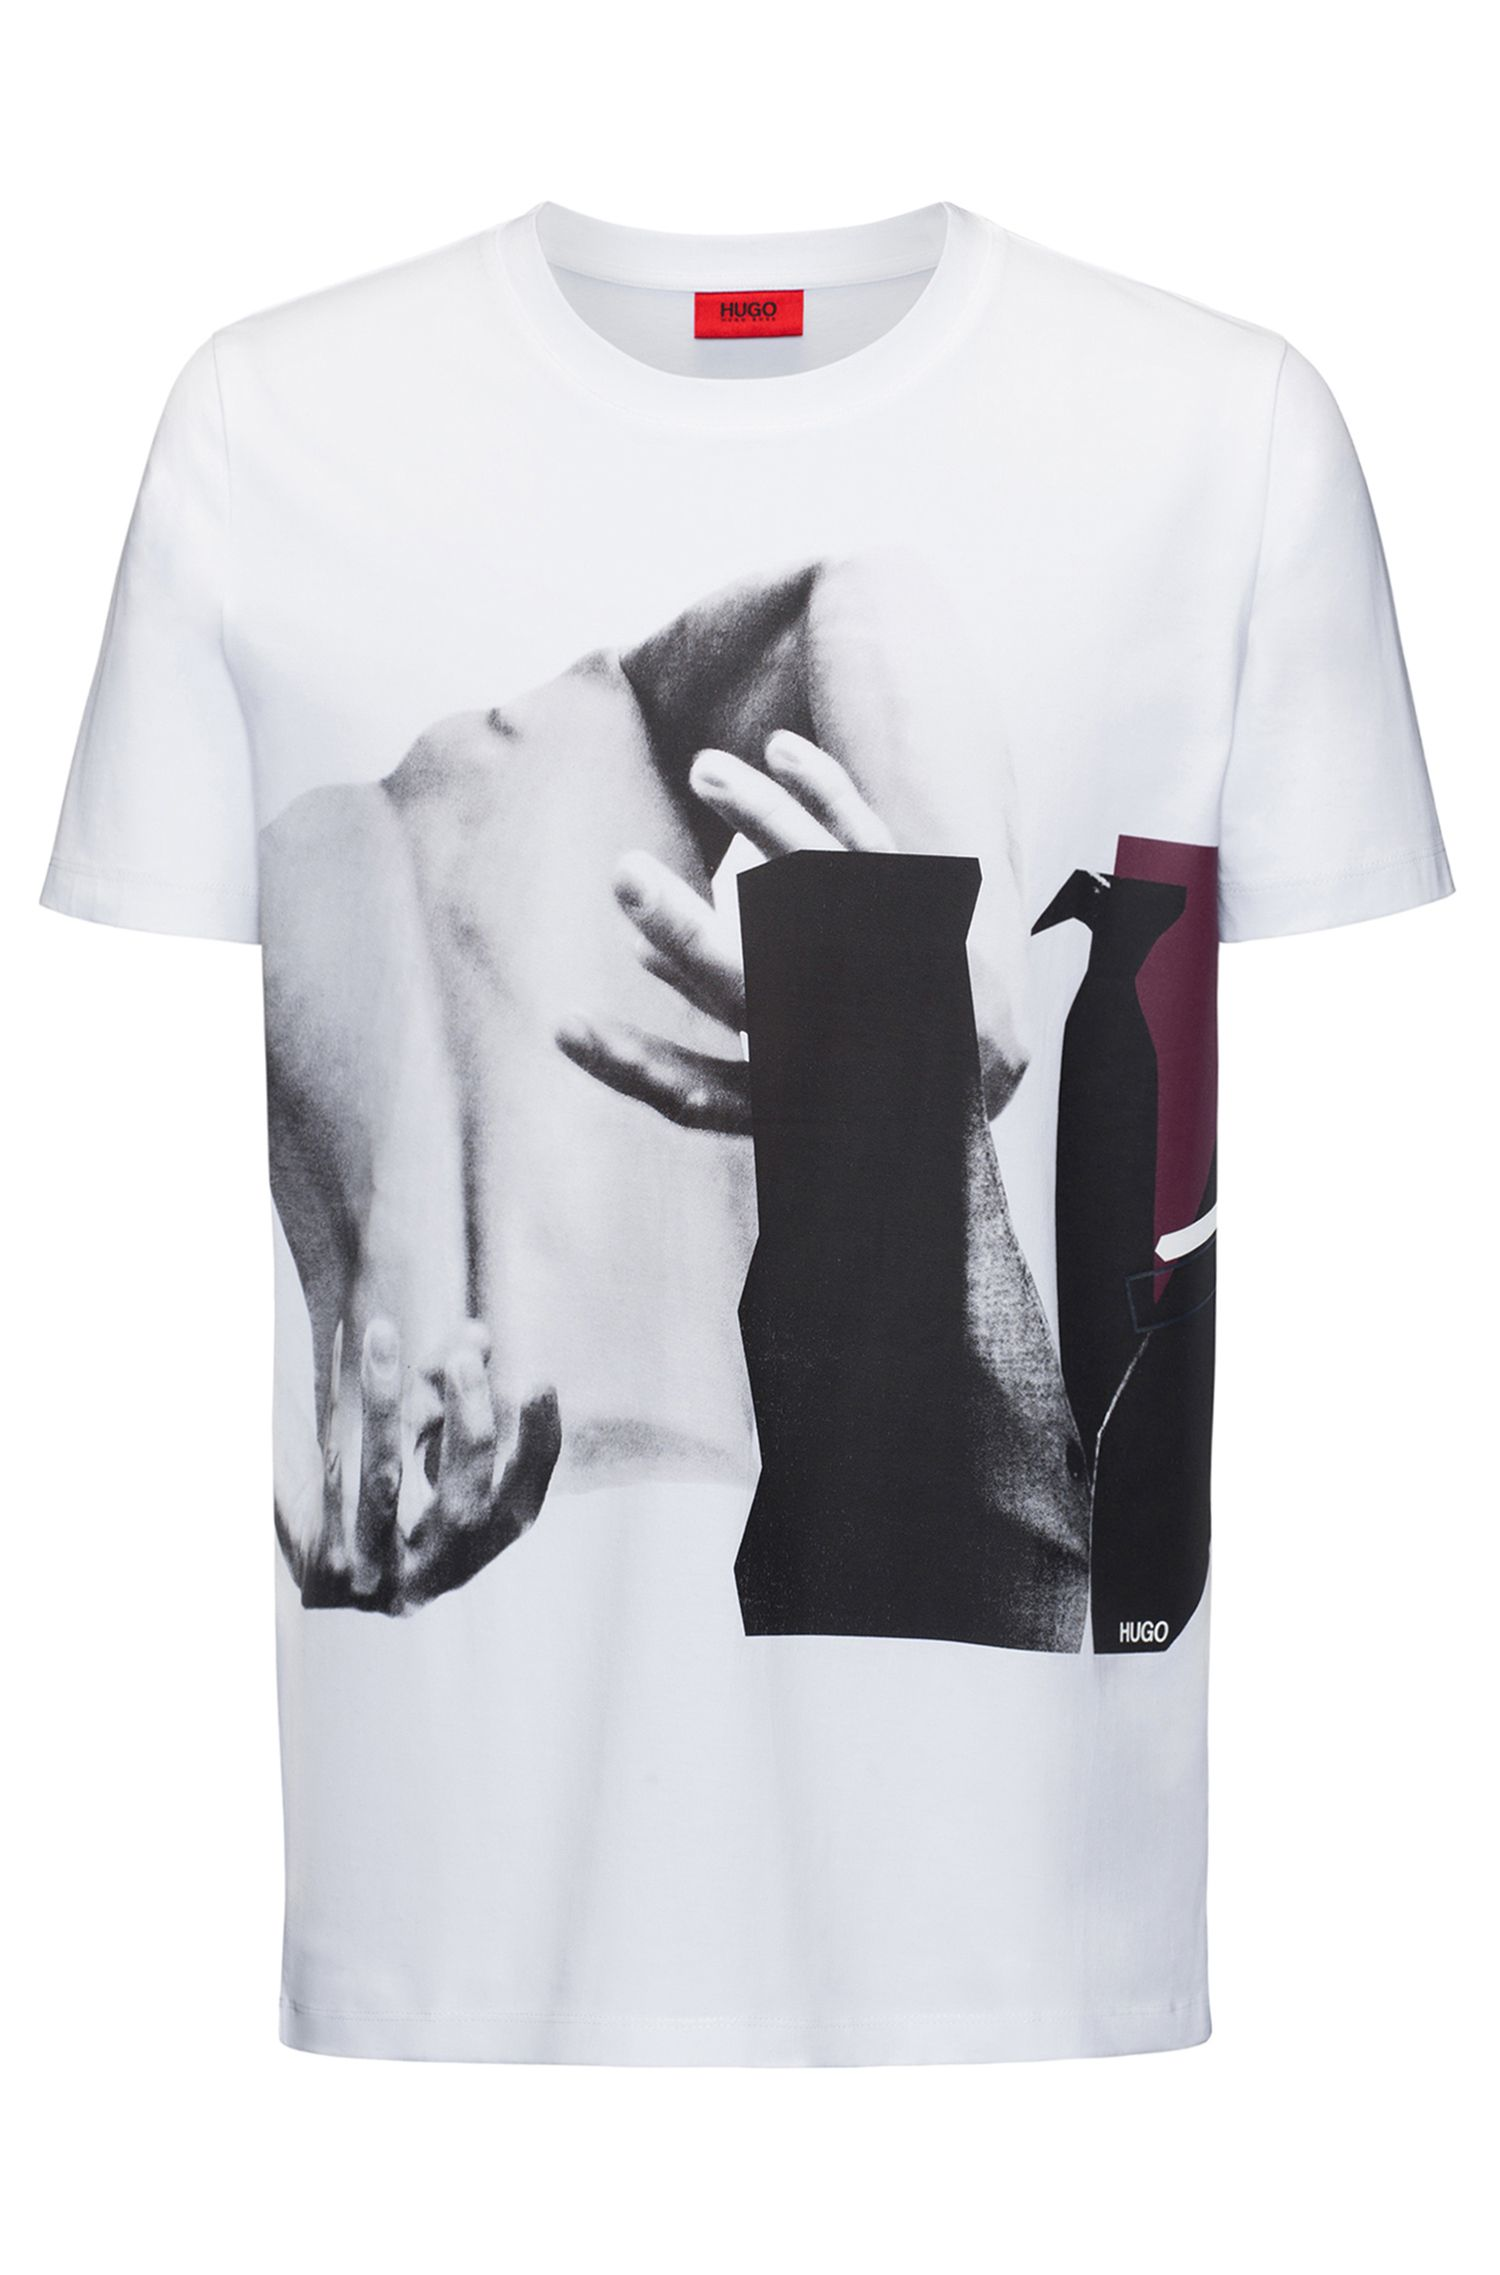 Printed Cotton T-Shirt | Dack